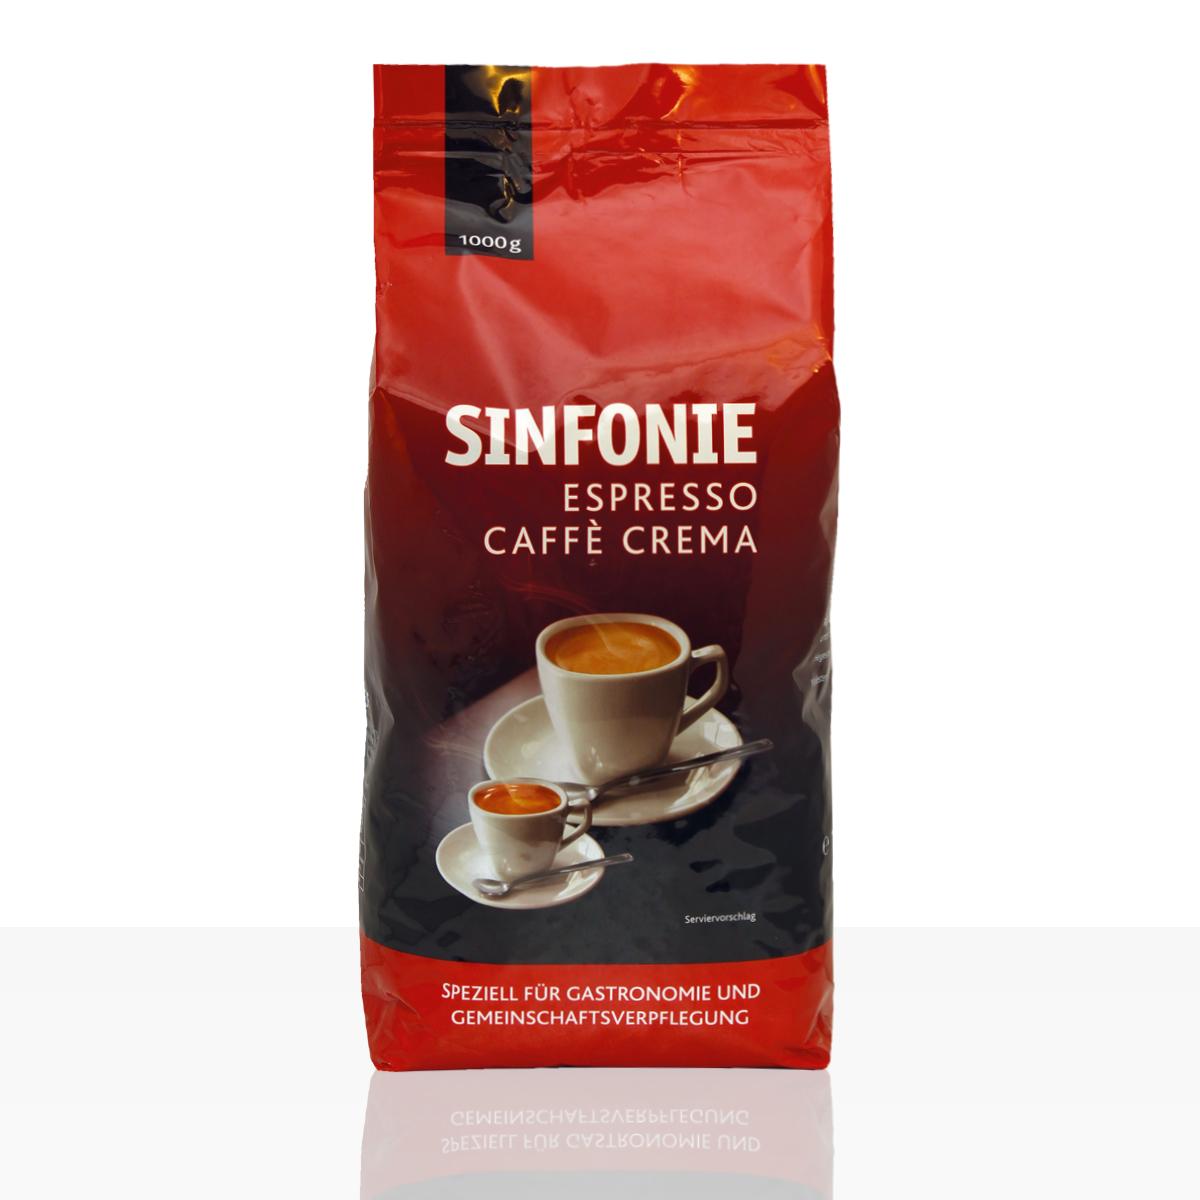 Jacobs Sinfonie Caffe Crema & Espresso Hybridbohne - 1kg ganze Kaffee-Bohne